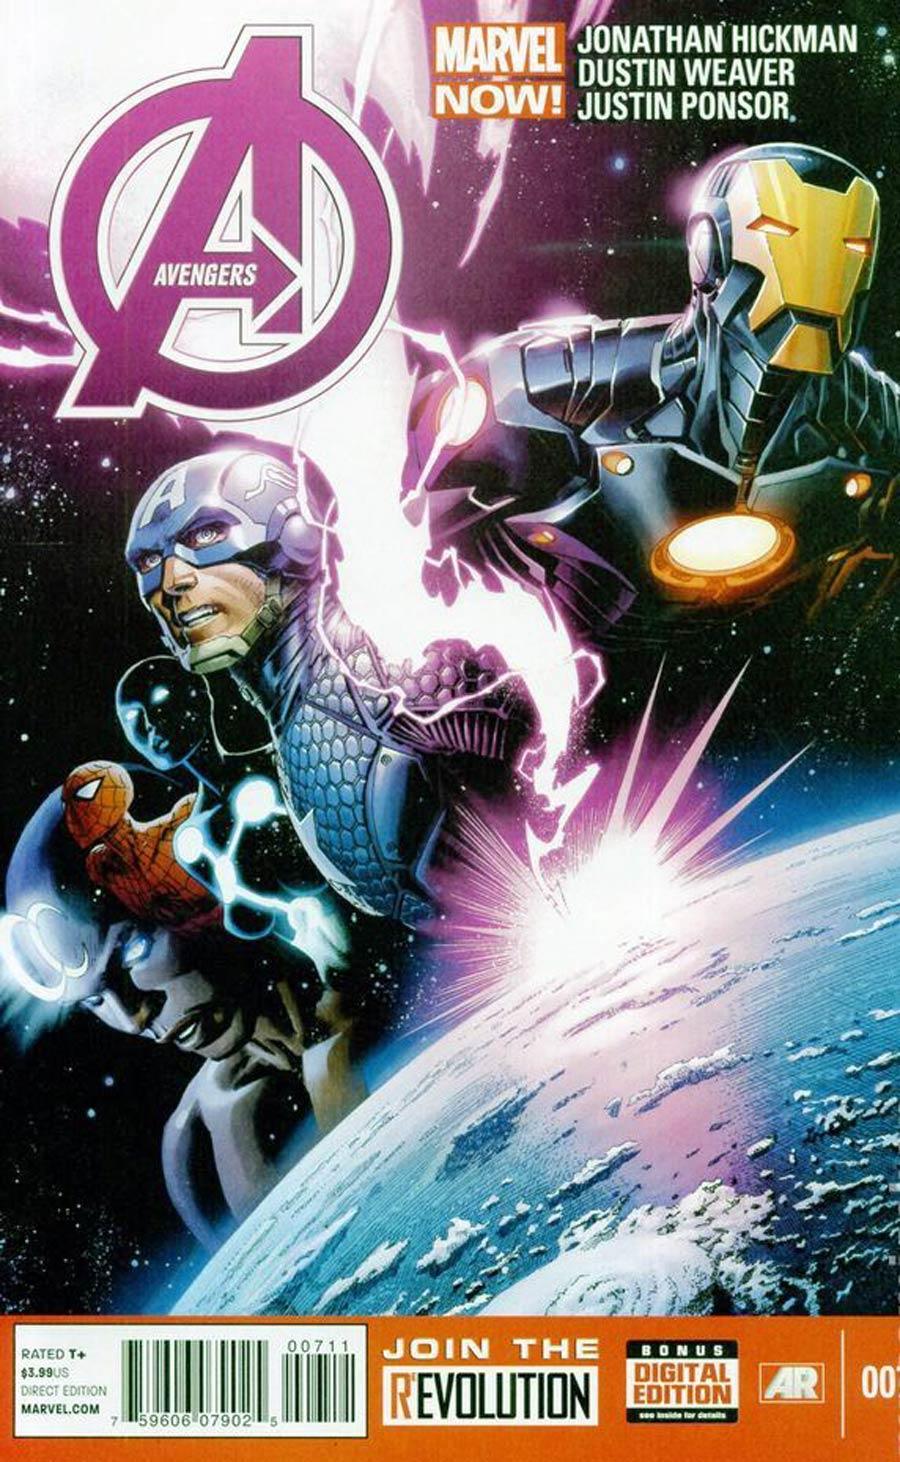 Avengers Vol 5 #7